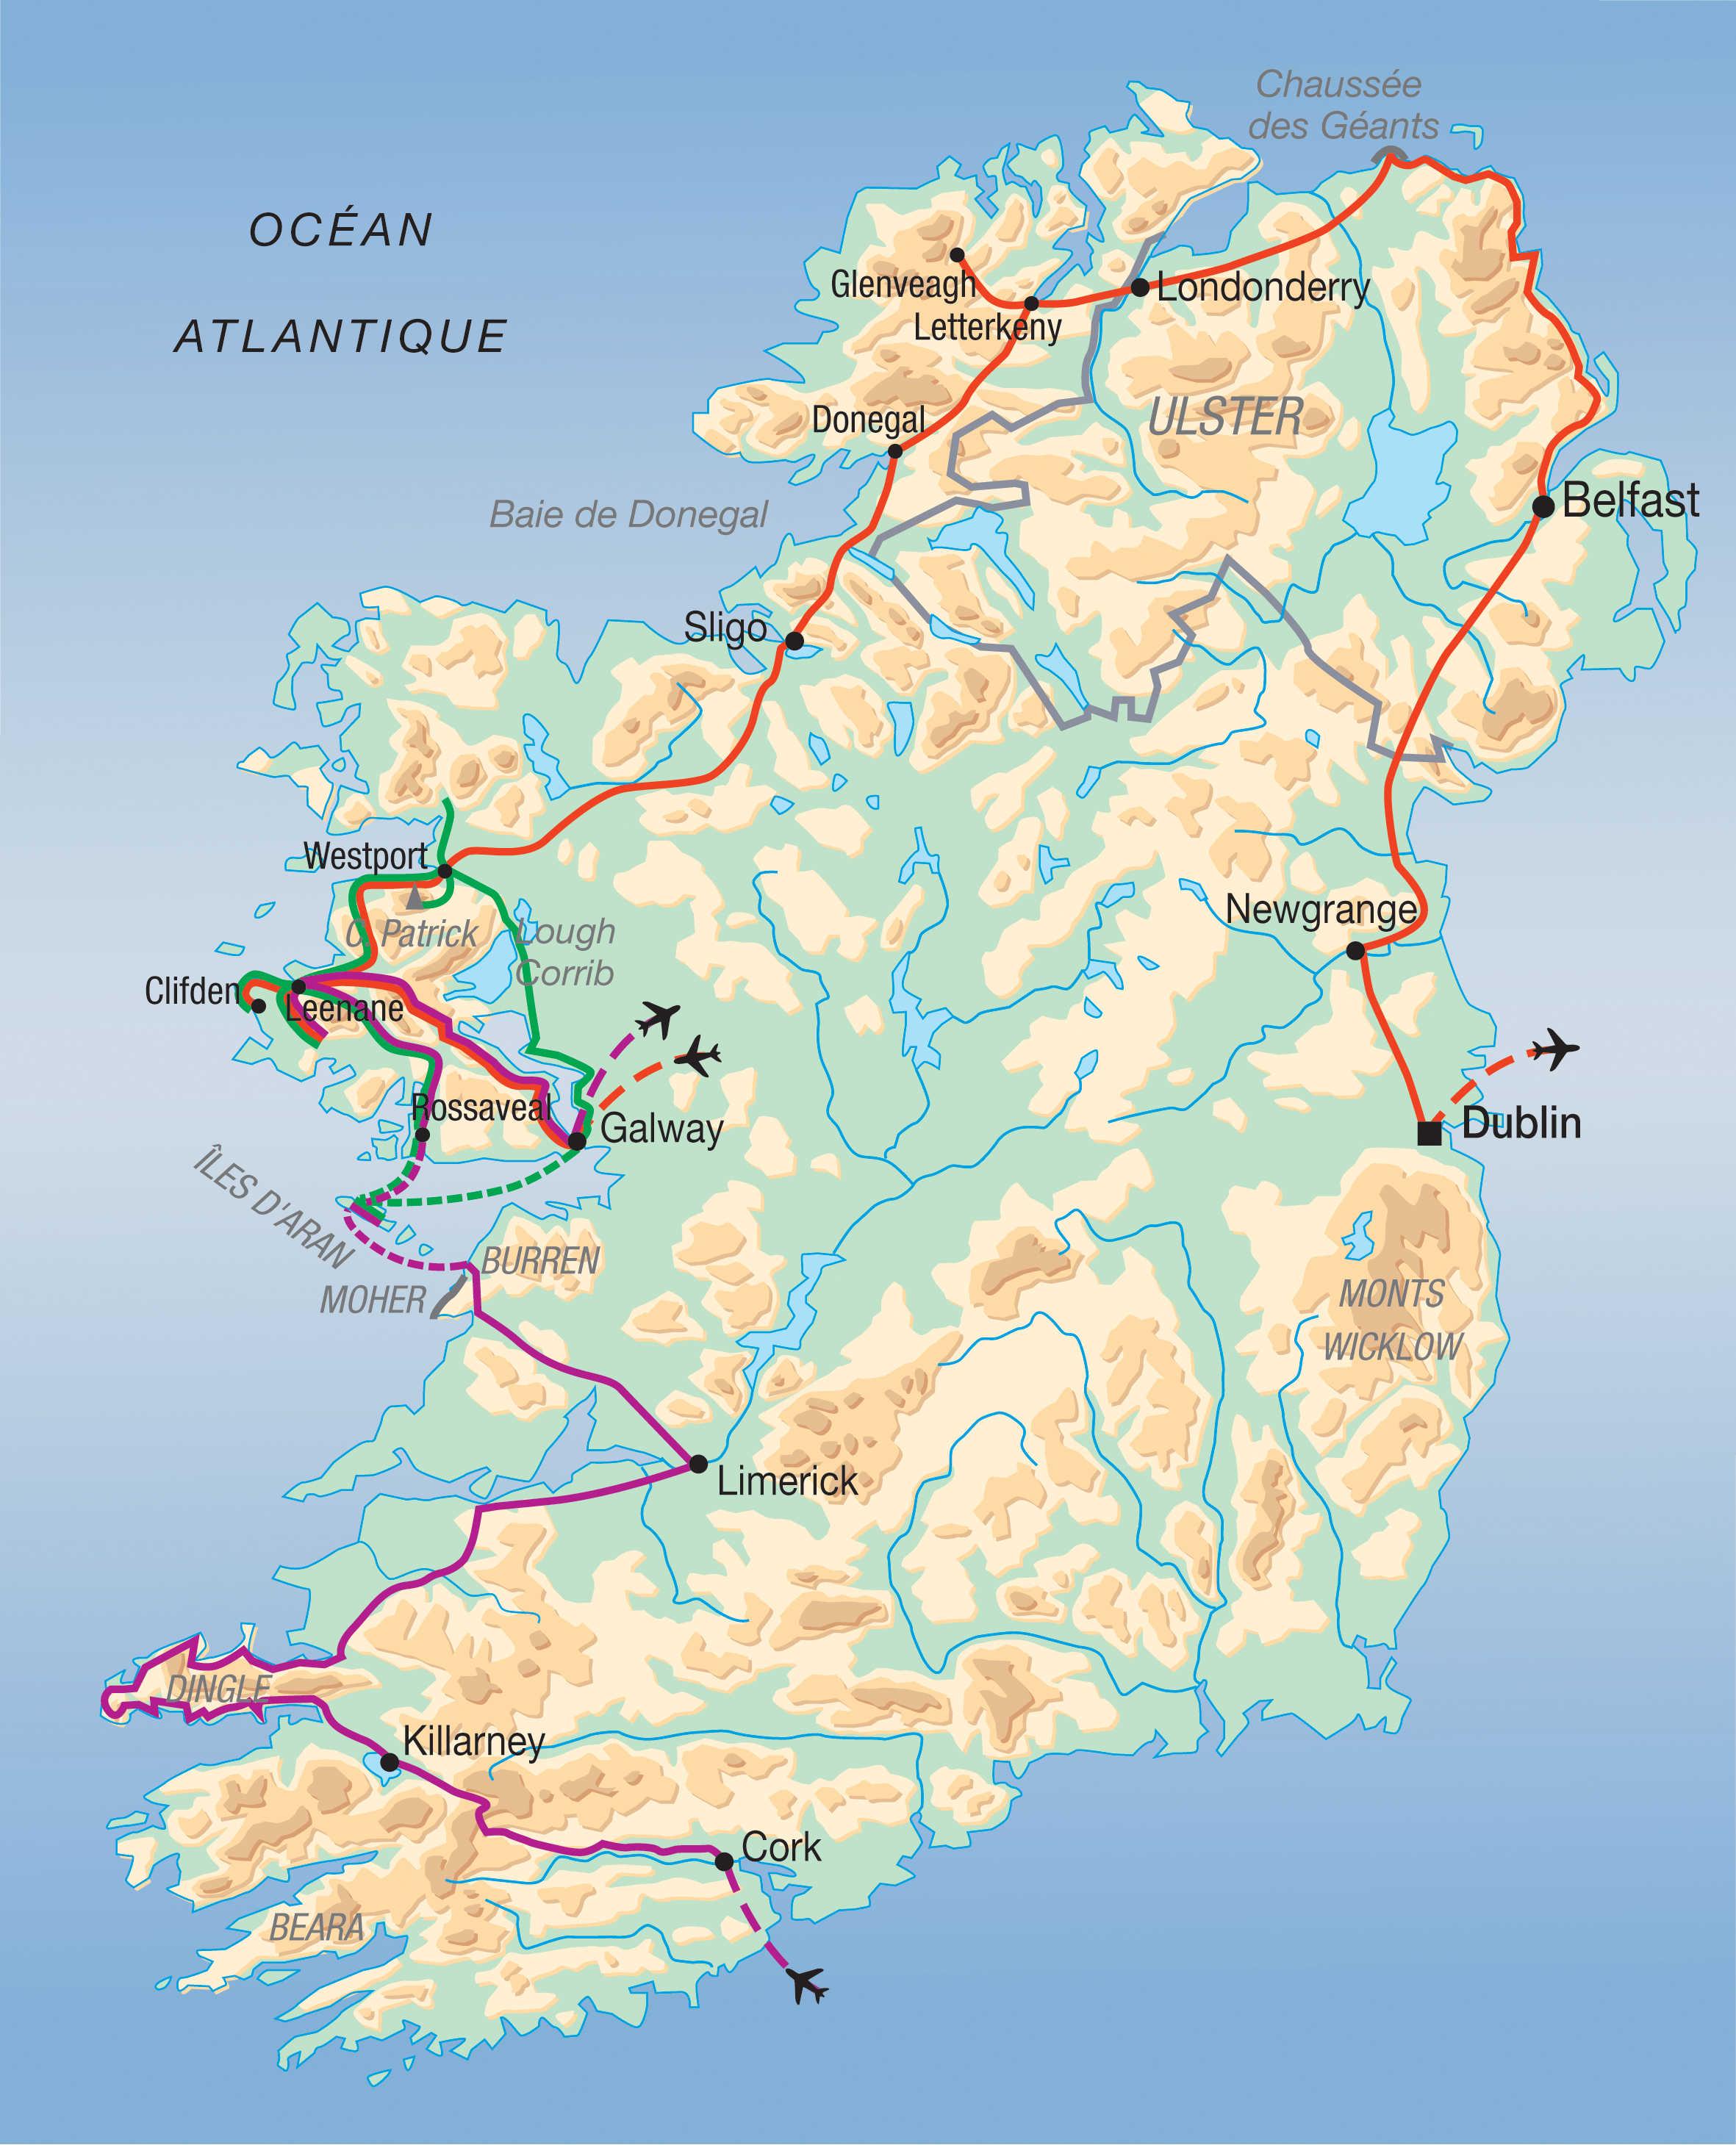 Carte du grand tour de l'Irlande